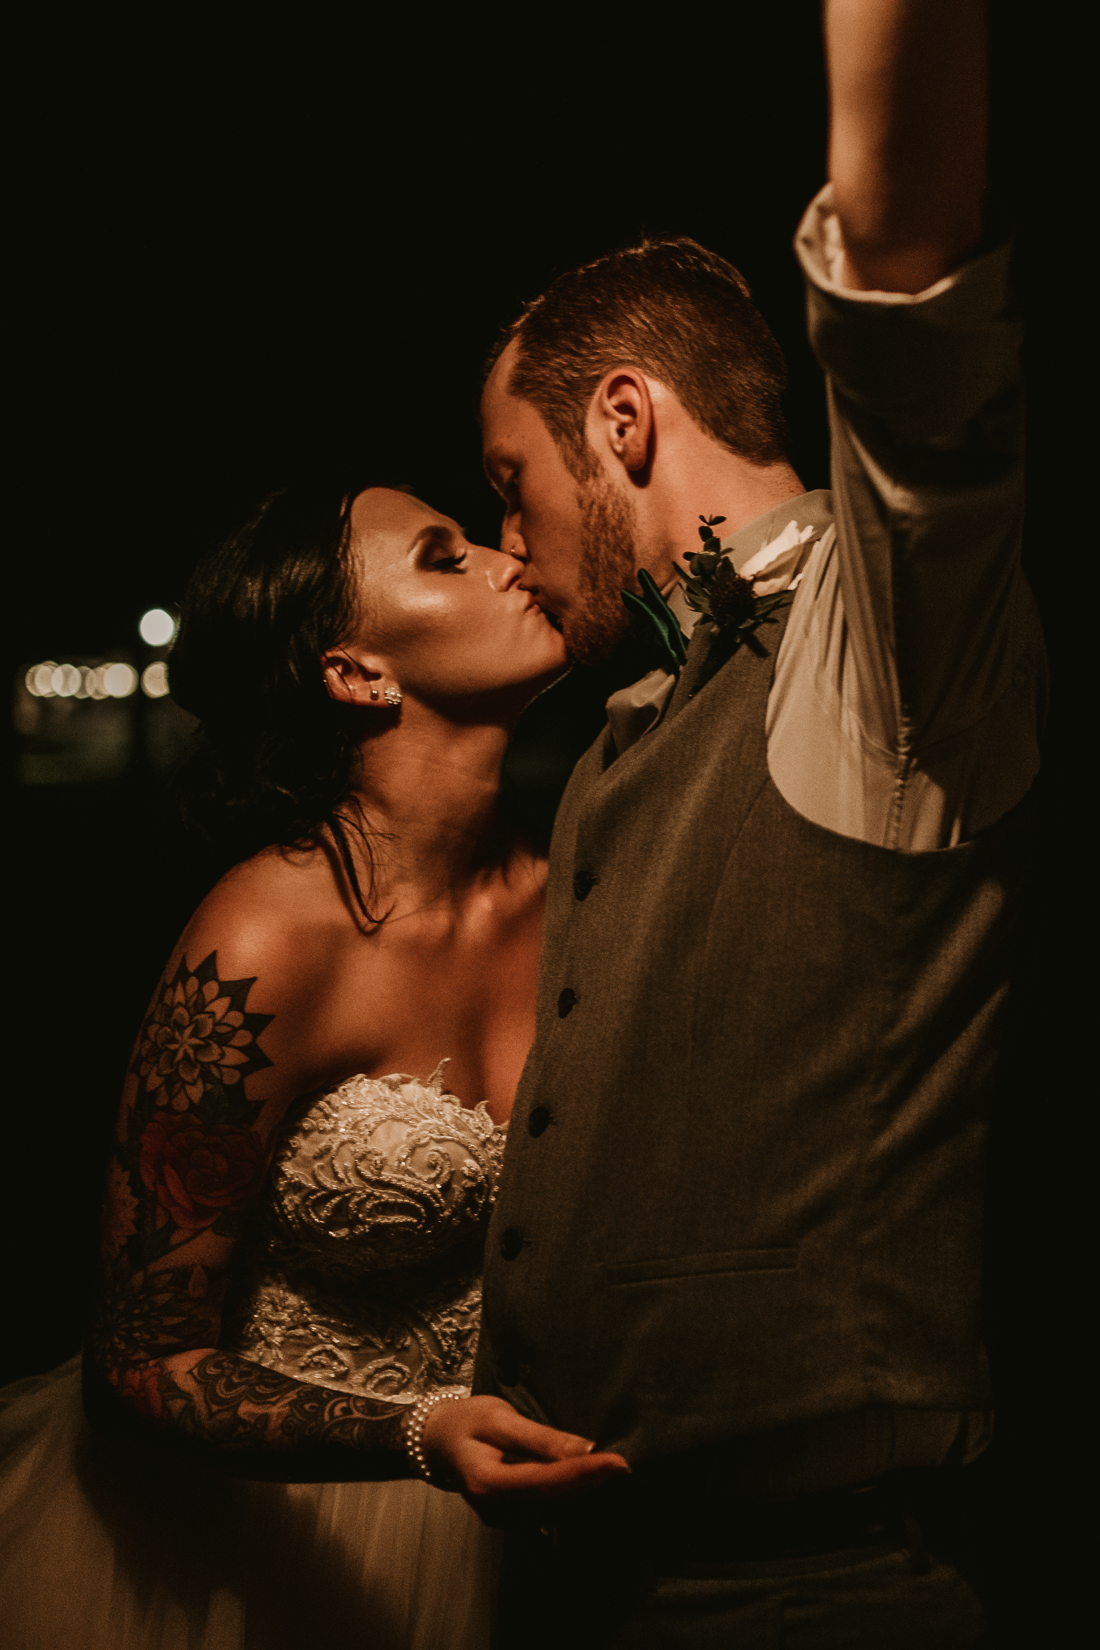 olivia_zay_wedding_09_2018-9253.jpg